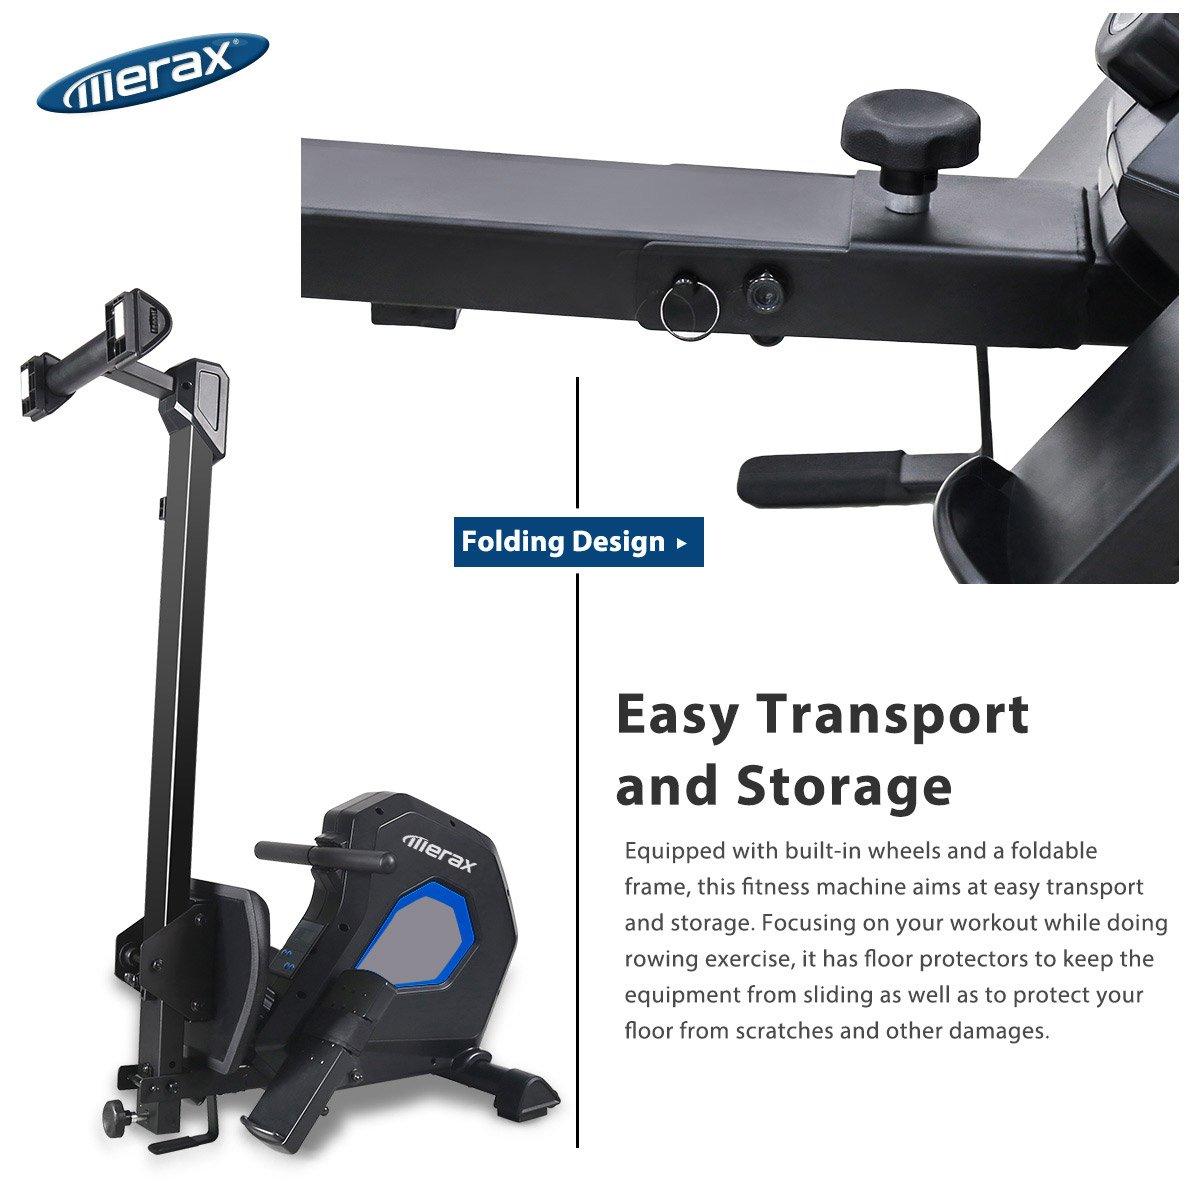 Merax Magnetic Exercise Rower Adjustable Resistance Rowing Machine (BK) by Merax (Image #3)